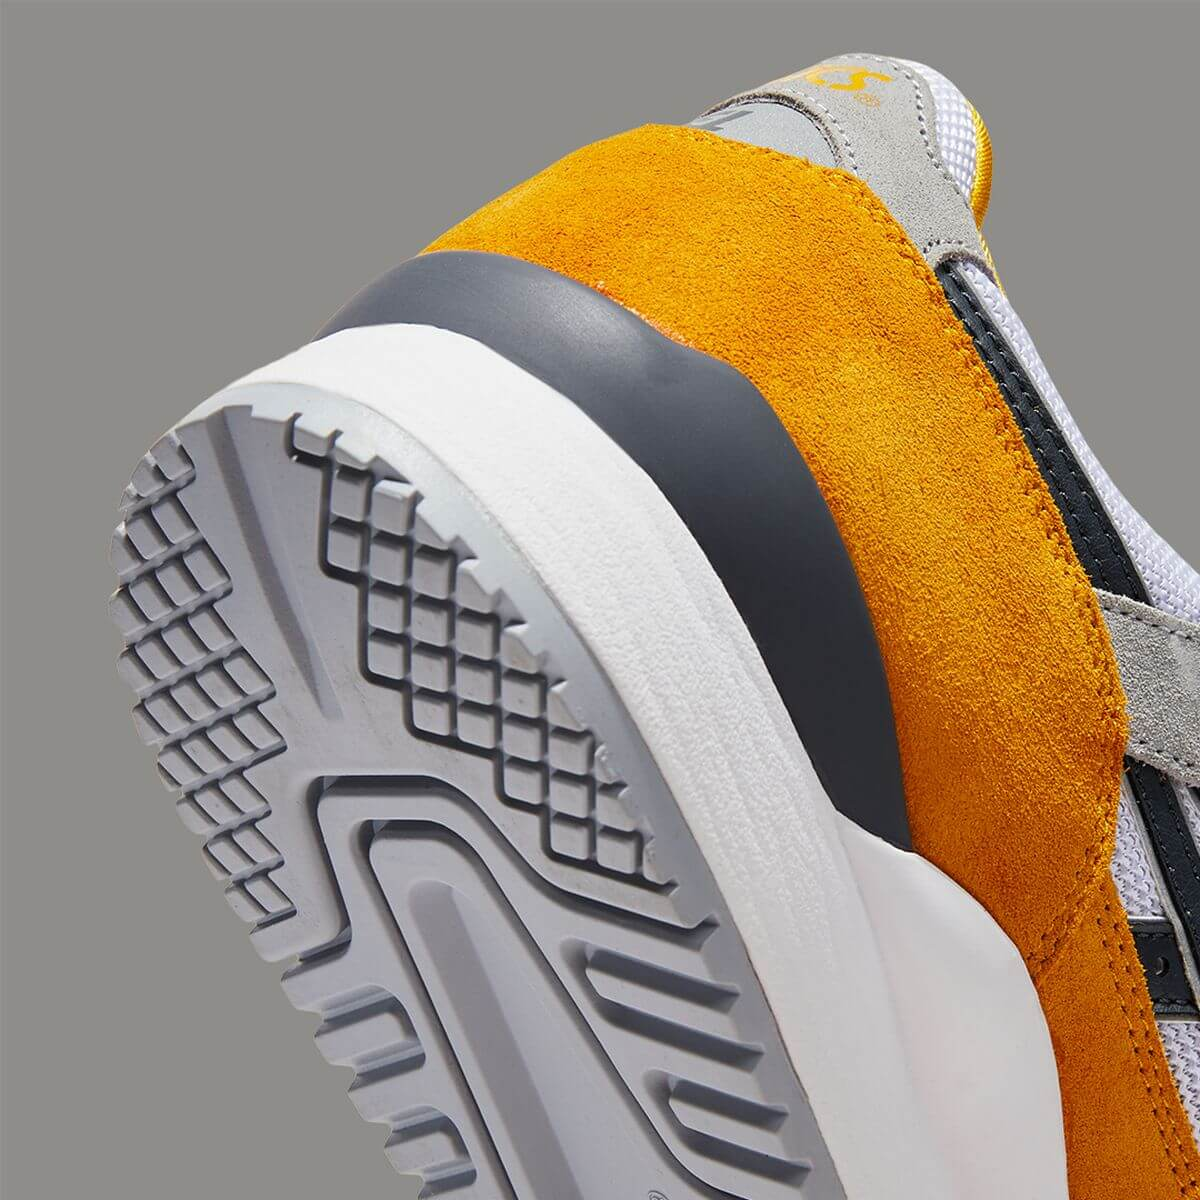 heel details of the ASICSSportStyle - GEL-LYTEIIIOG - sunflower/carrier grey - 1201A482-800